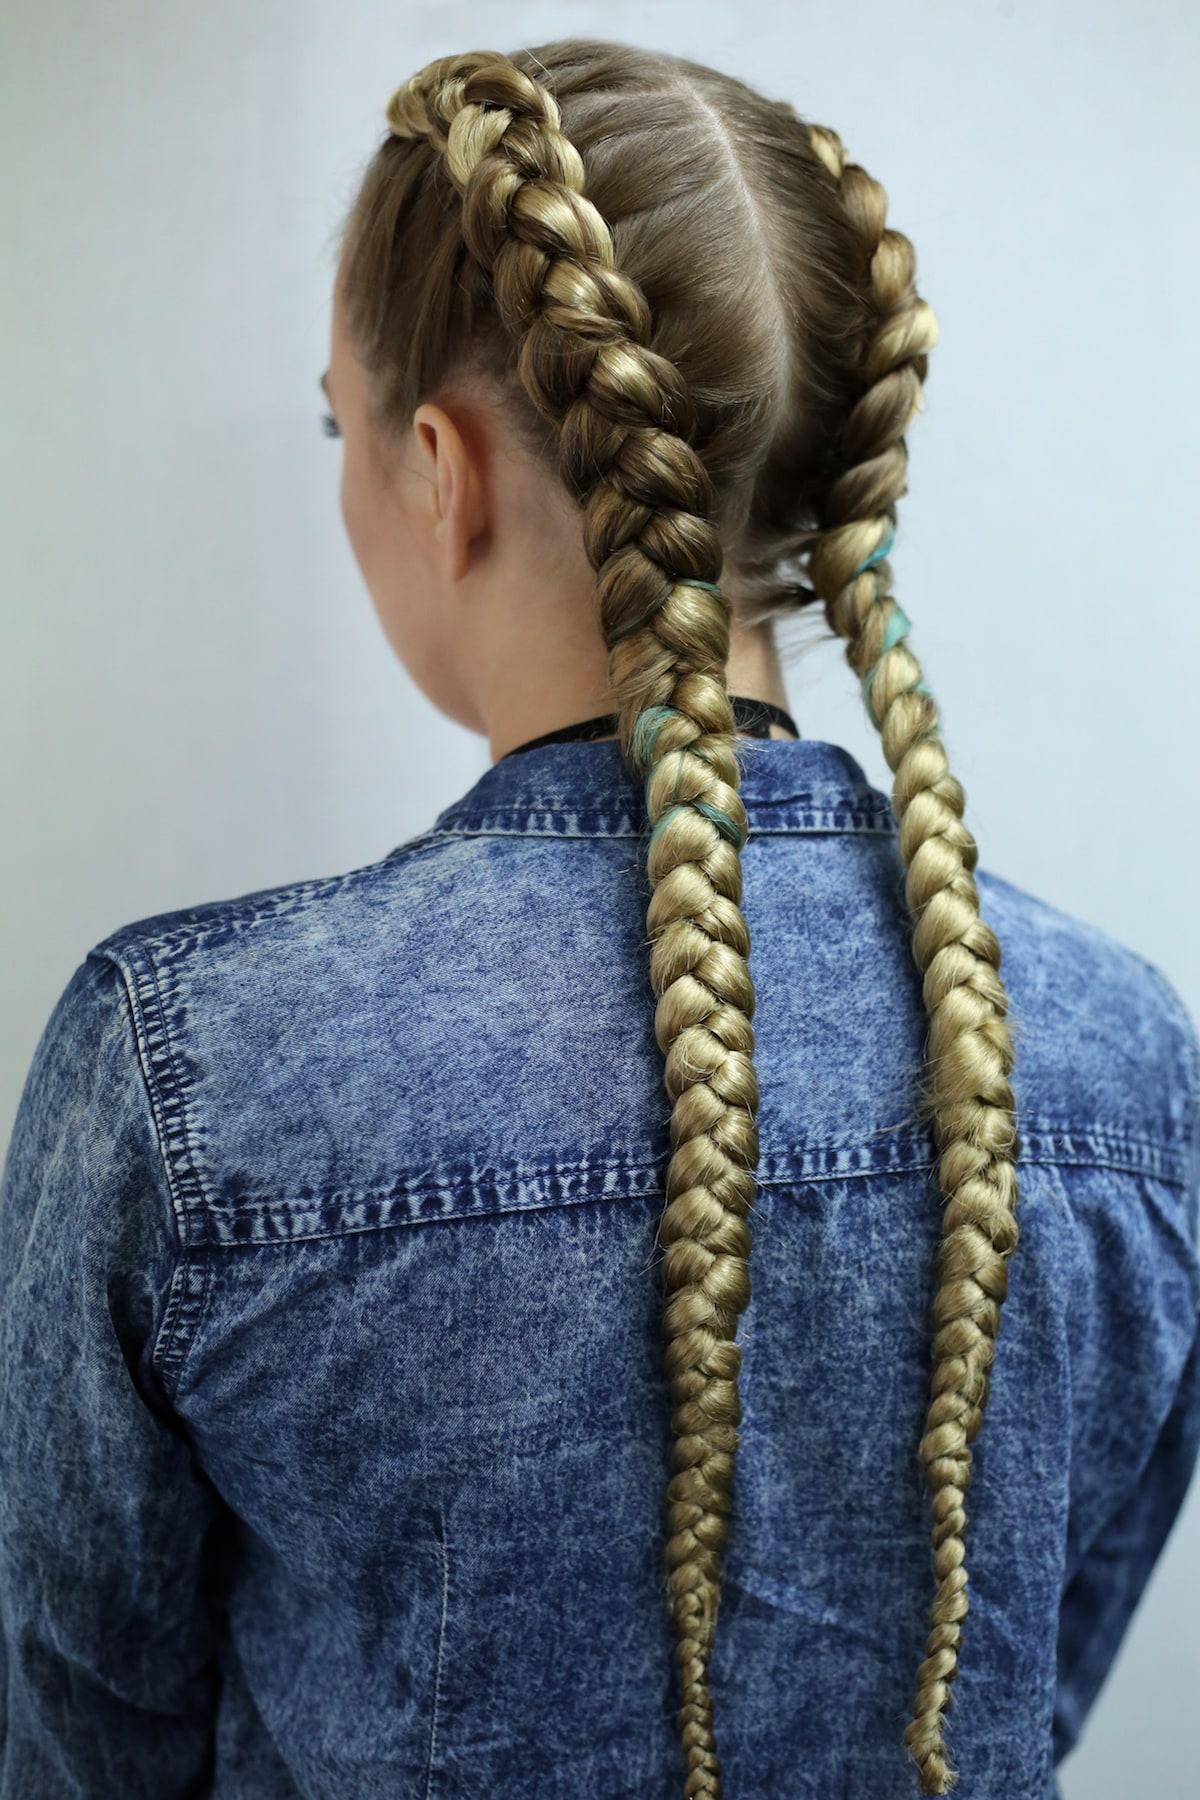 boxer braids pada rambut pirang panjang